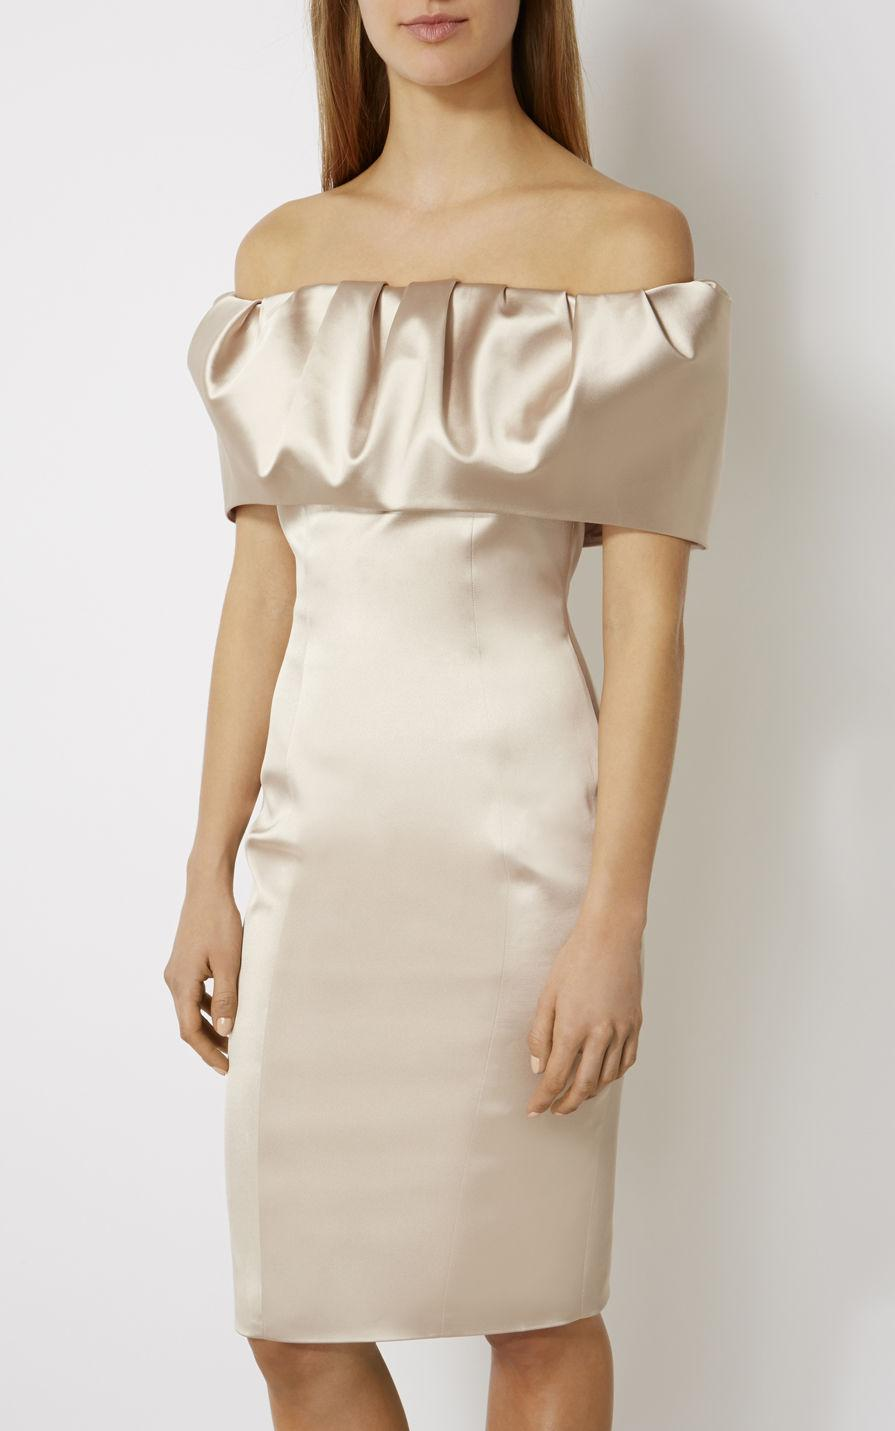 Karen Millen Off The Shoulder Pencil Dress Nude In Natural Lyst Jolie Clothing Joie Midi L